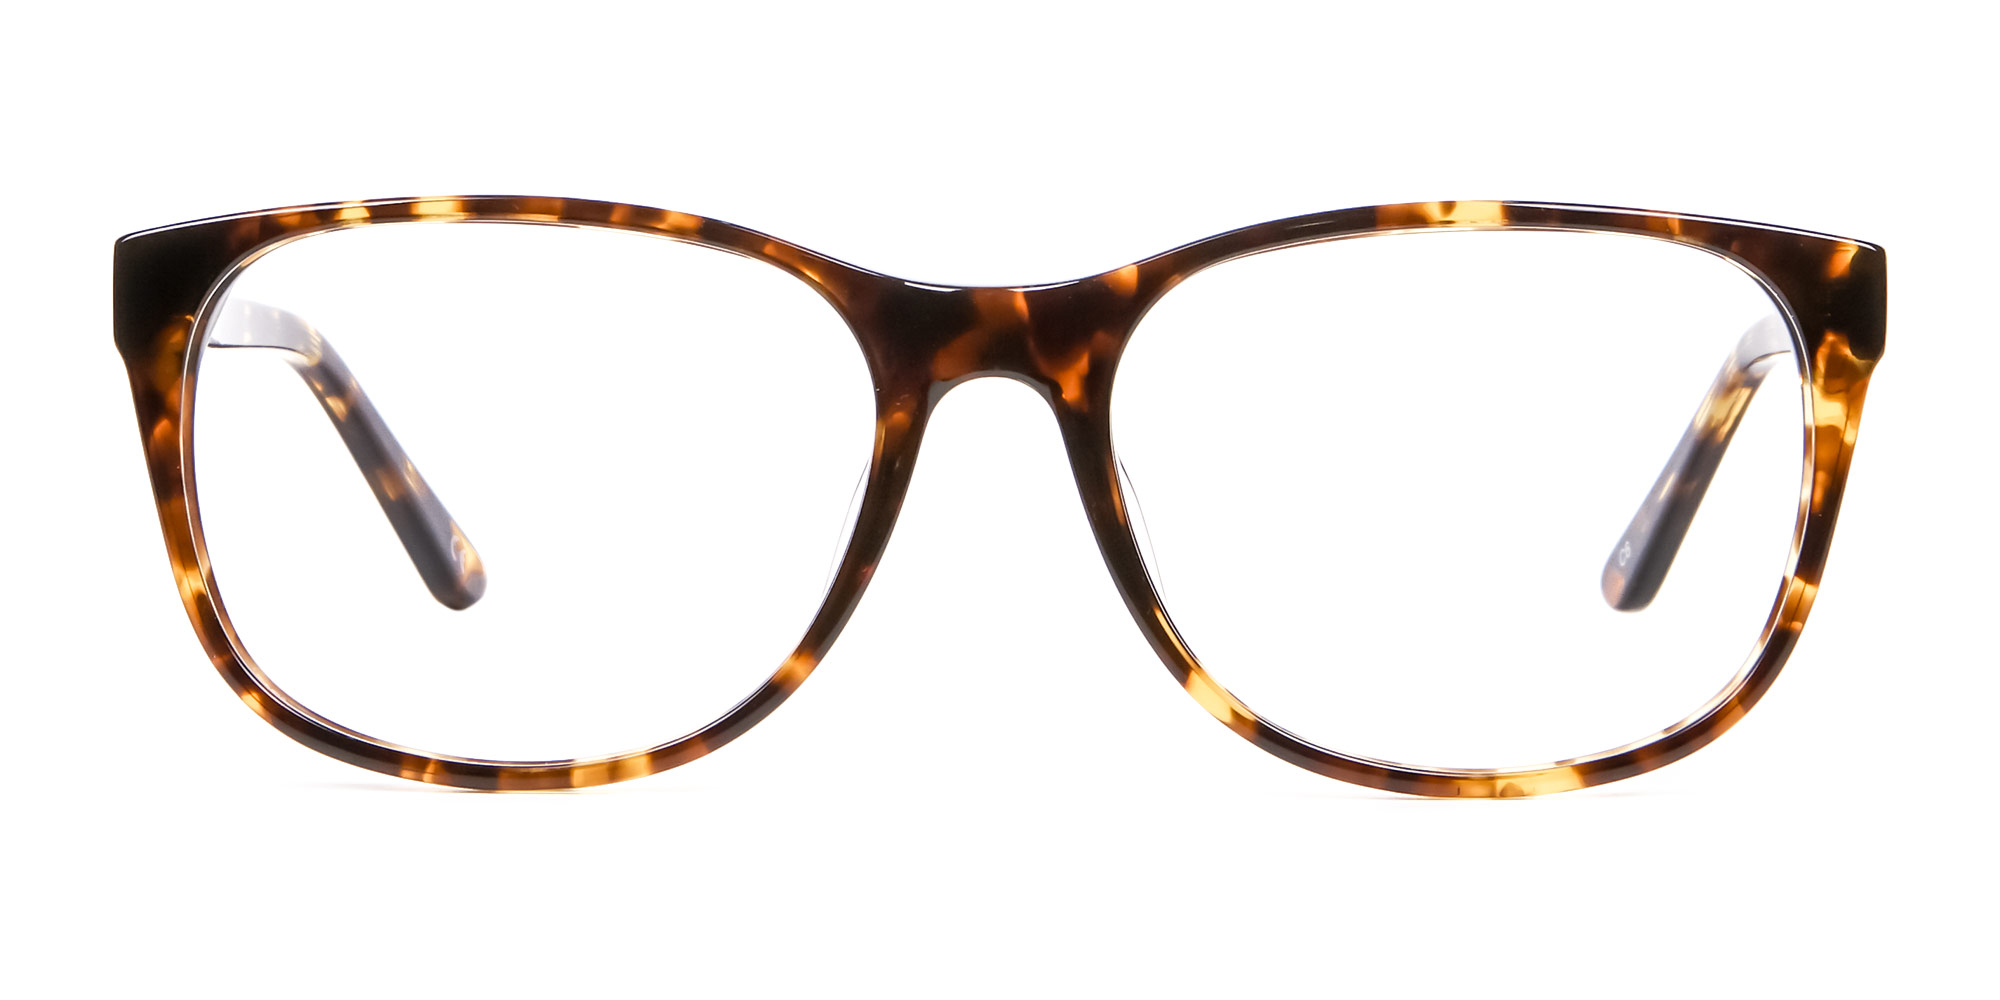 Yellow Tortoise Shell Glasses in Wayfarer